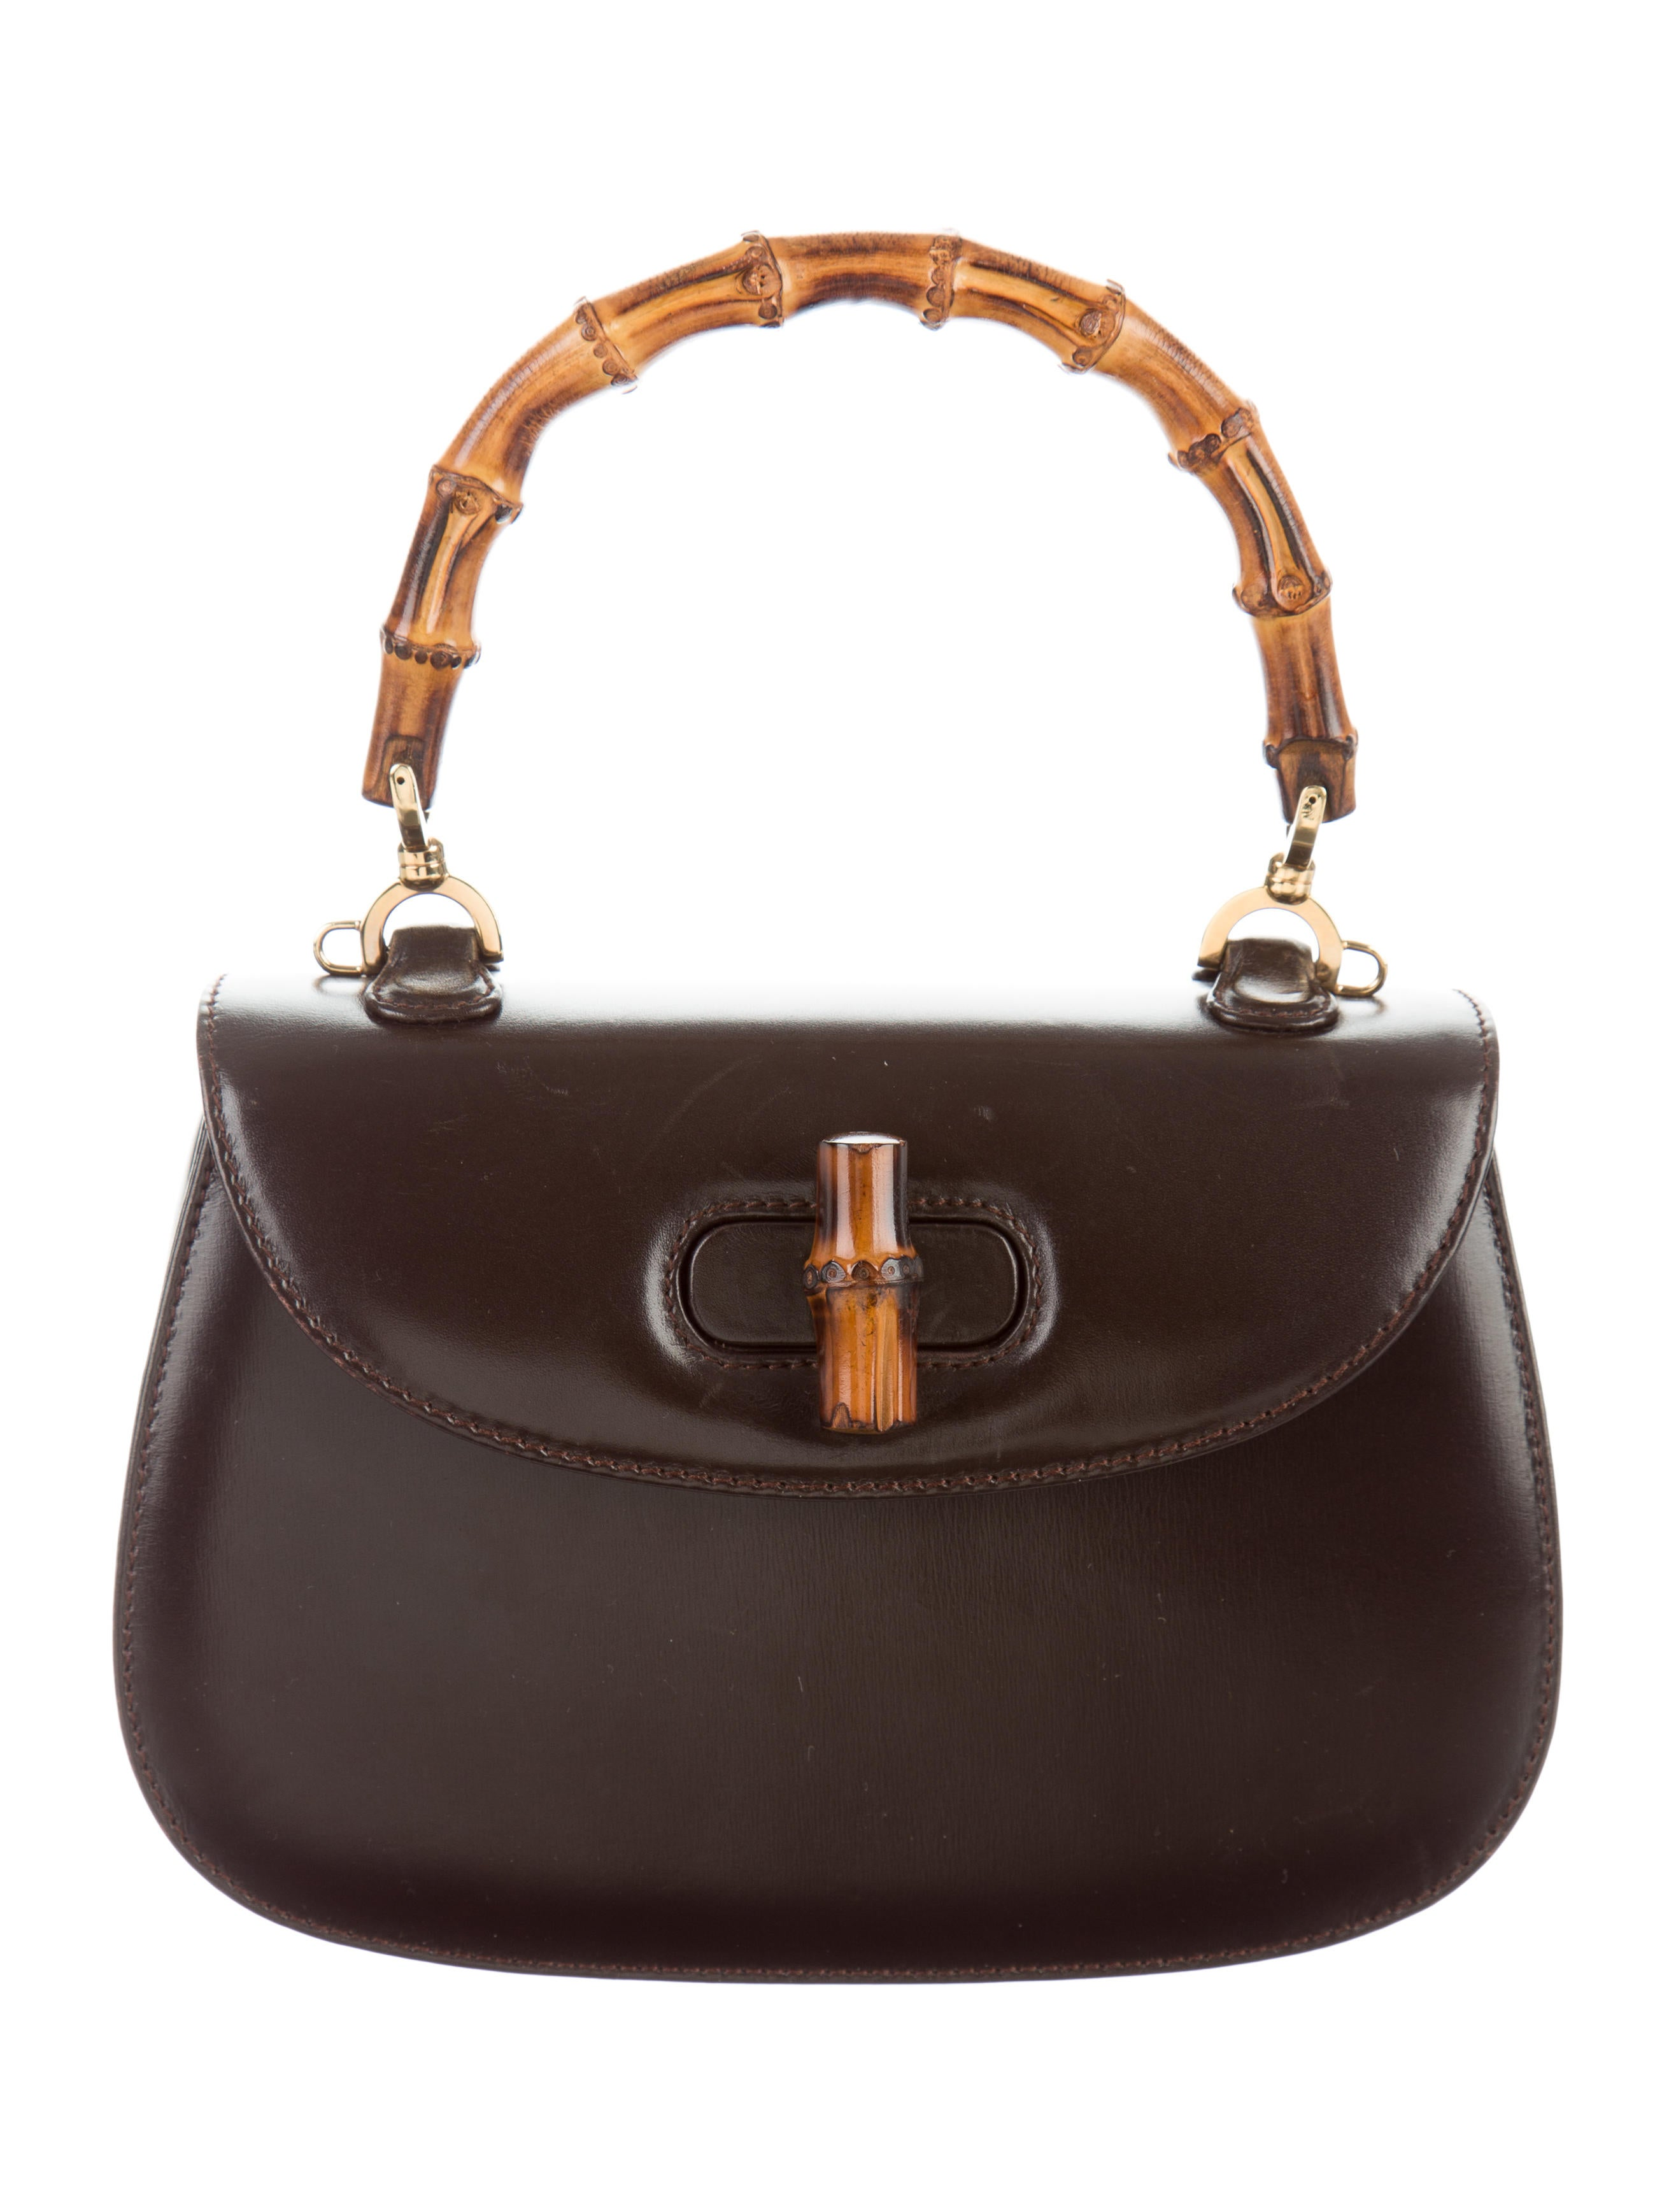 290c86a8e713 Gucci Vintage Bamboo Top Handle Bag - Handbags - GUC160857 .